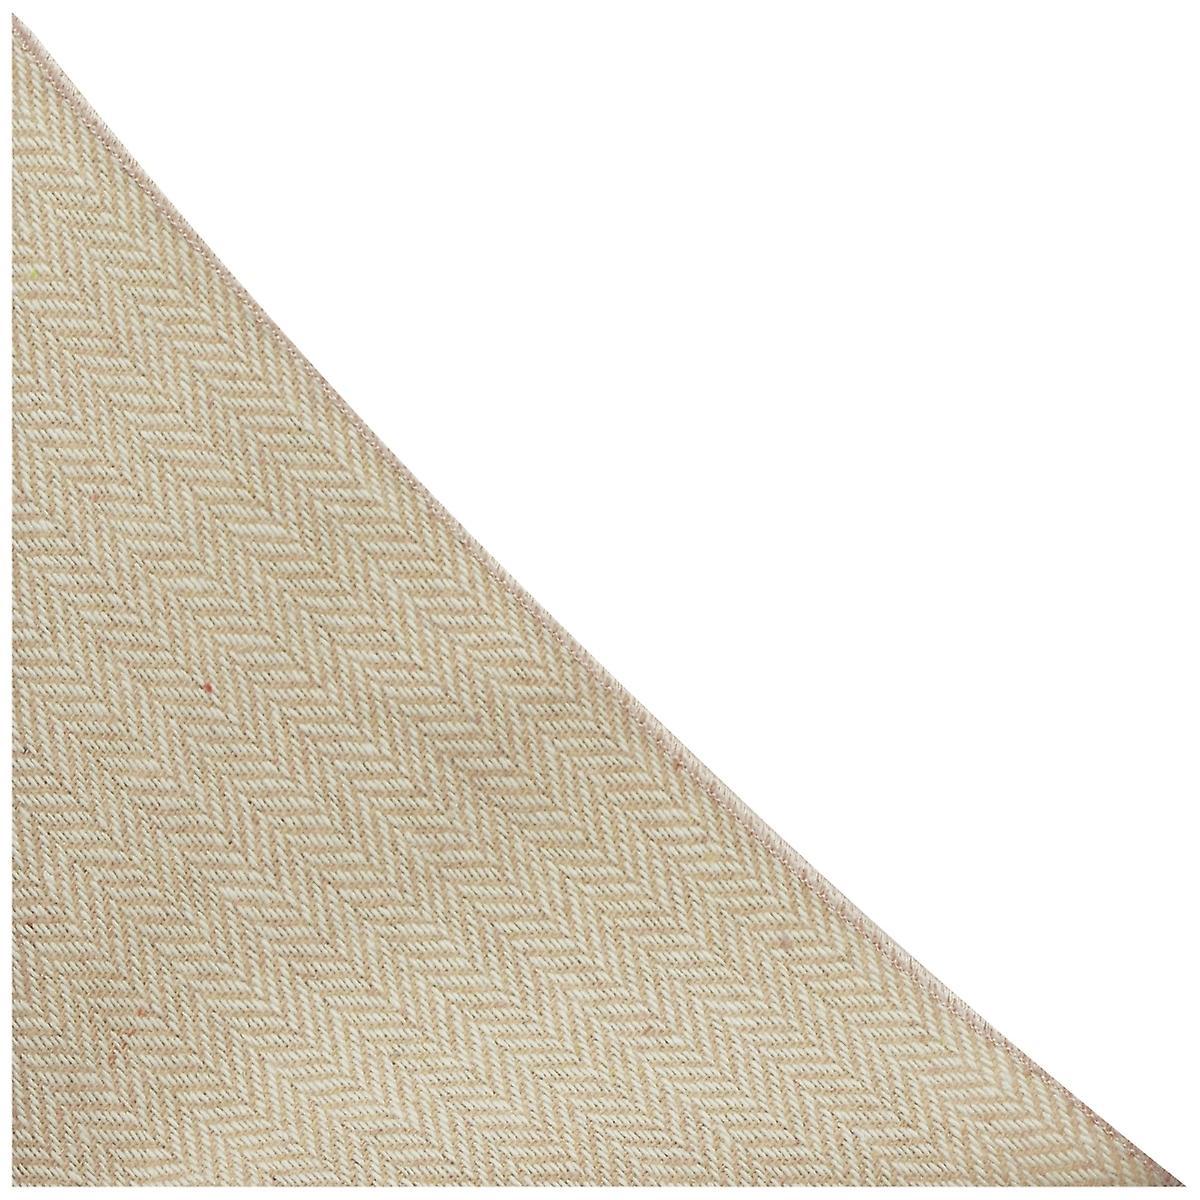 Gold & Cream Herringbone Pocket Square, Handkerchief